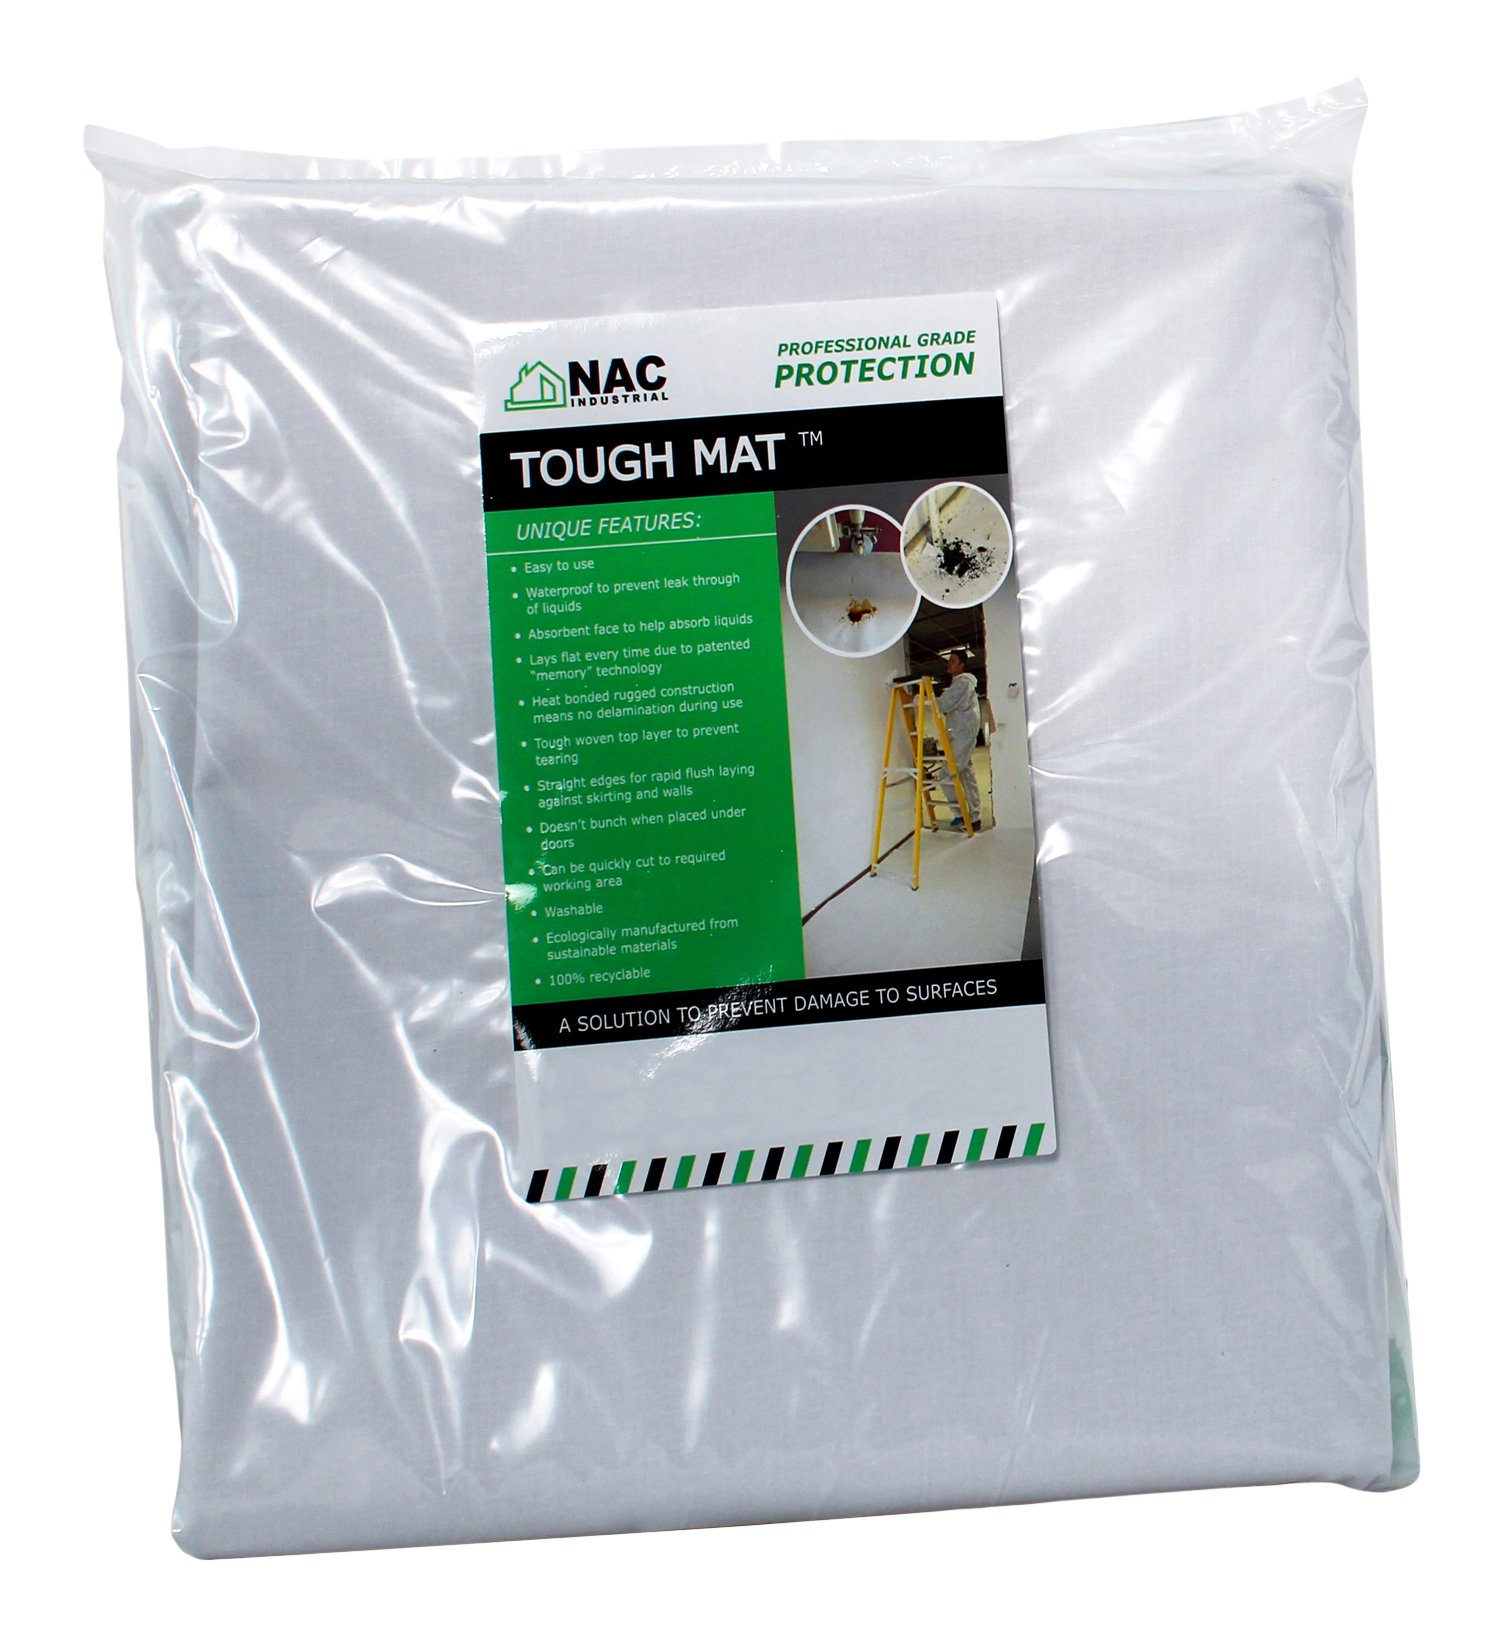 NAC INDUSTRIAL TMP050 Professional Waterproof HD Canvas Drop Cloth, Tough Mat